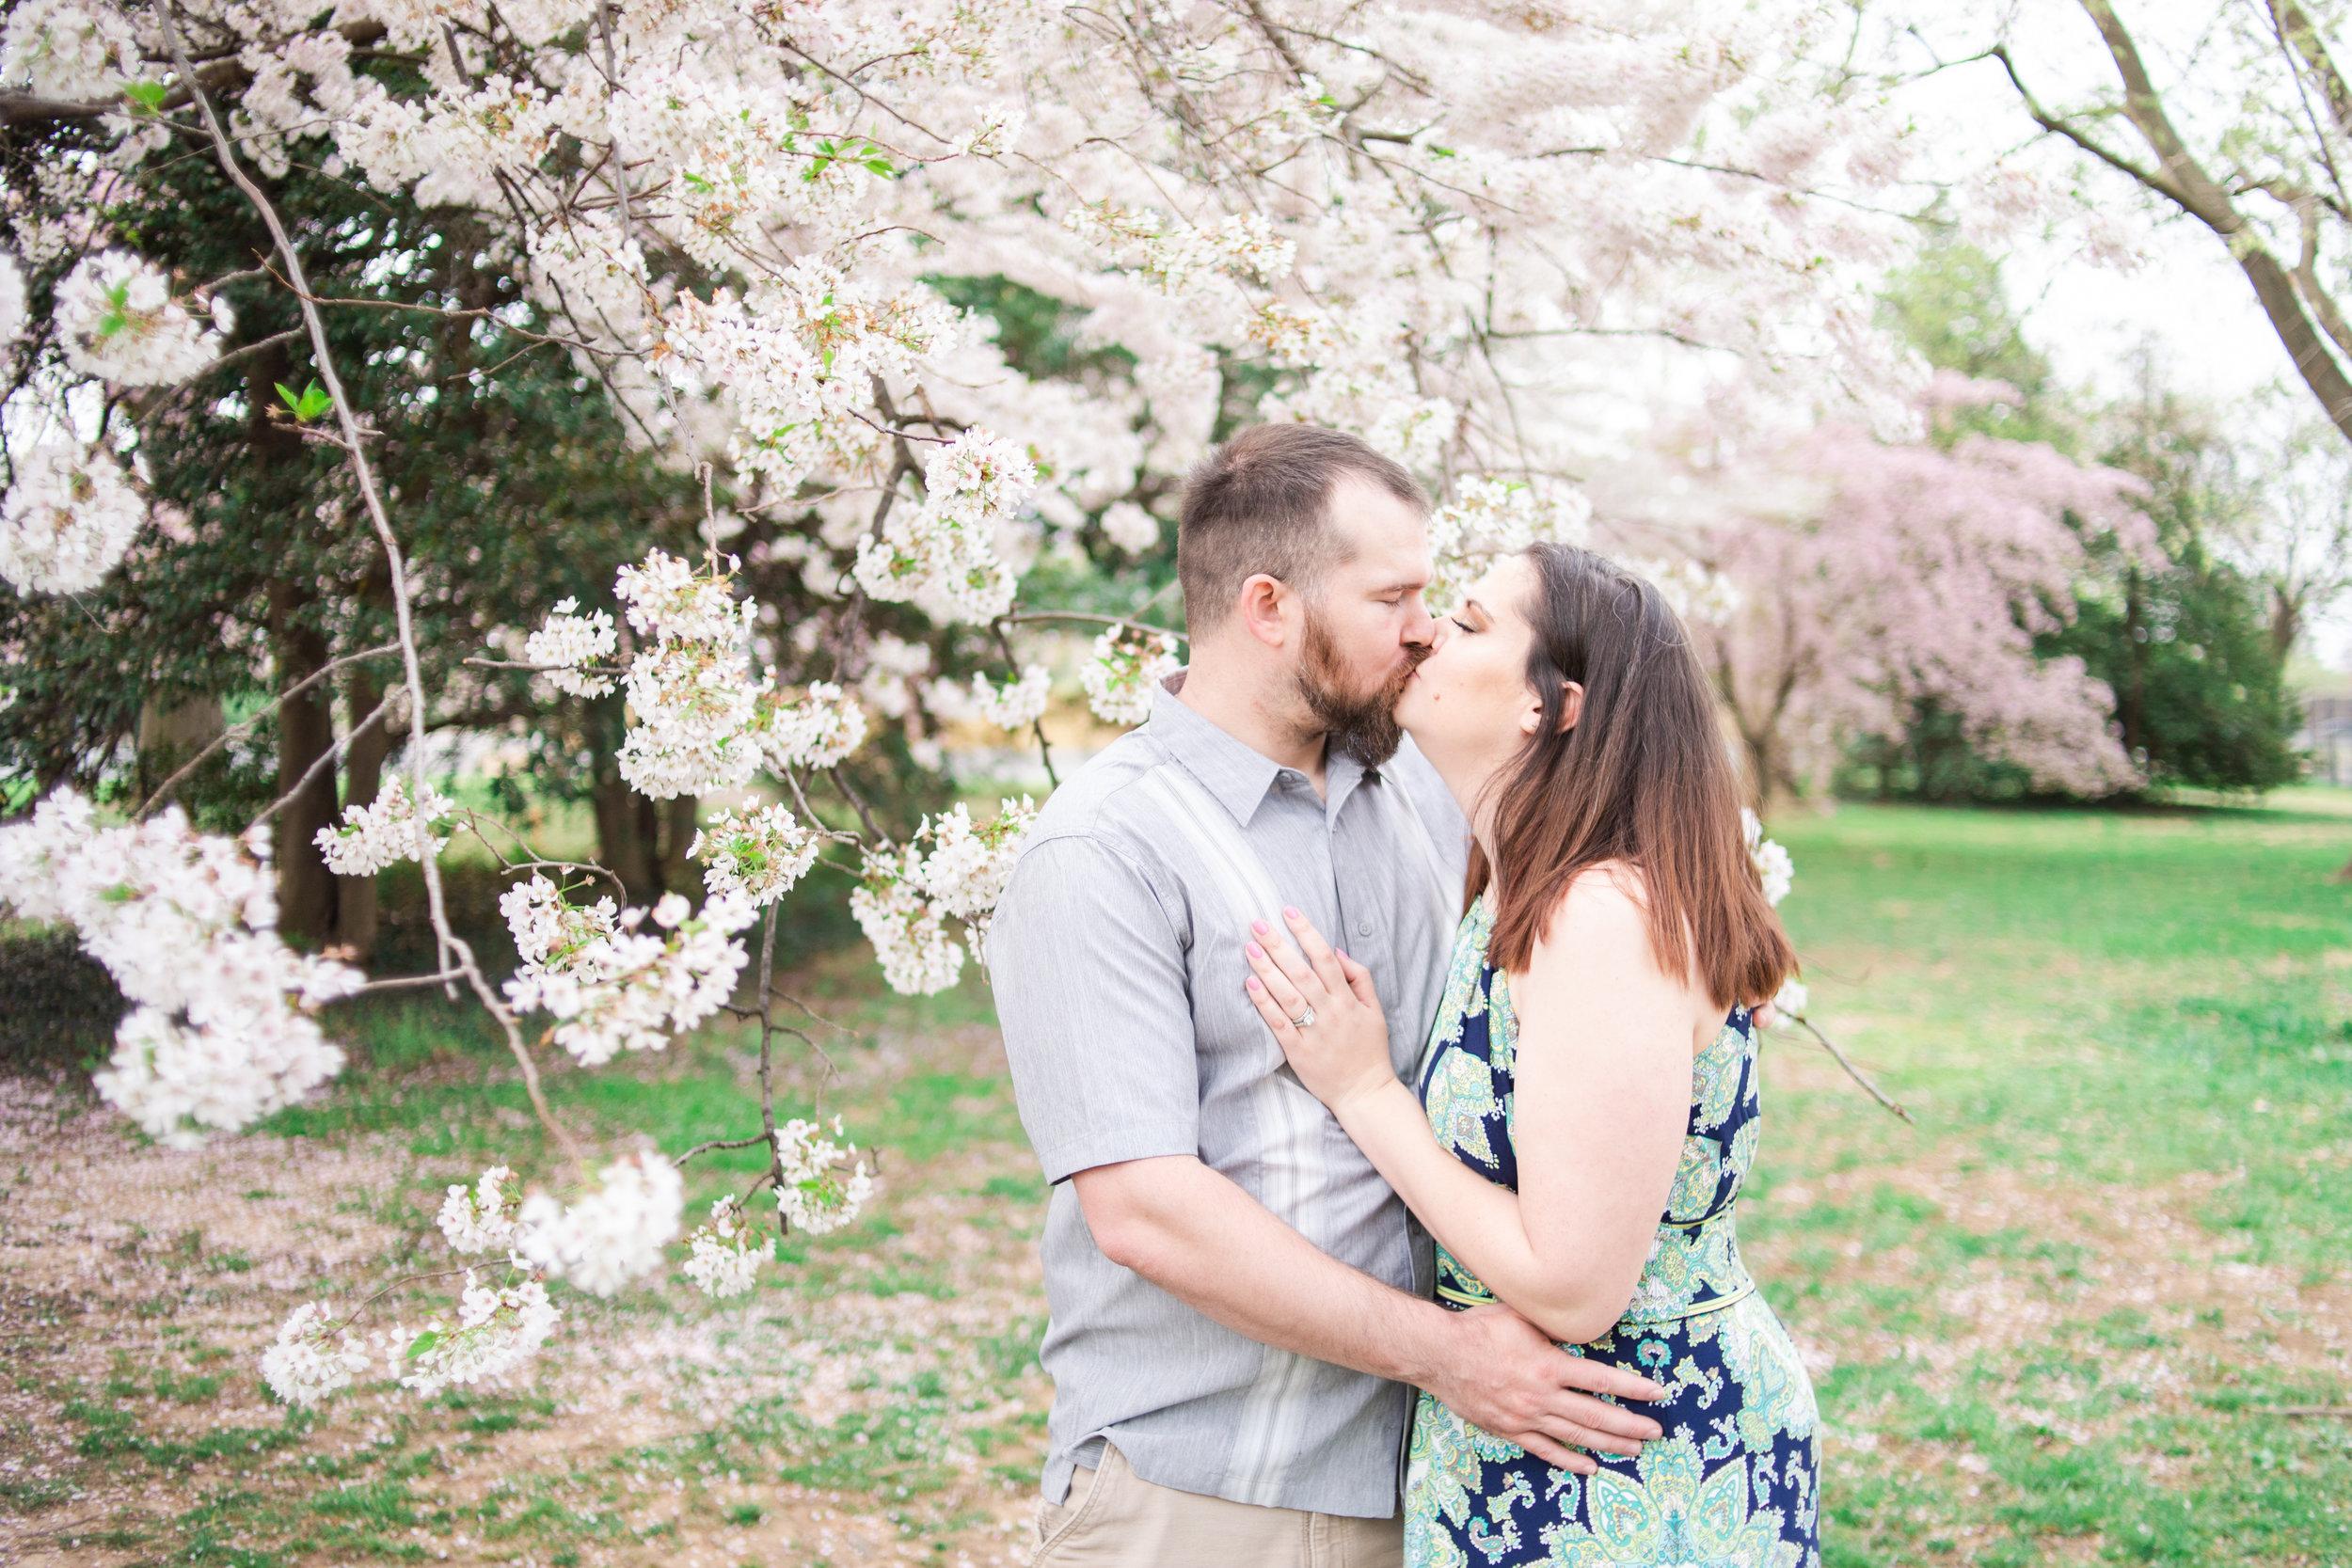 mjmp shannanjohn dc cherry blossom engagement session-16.jpg